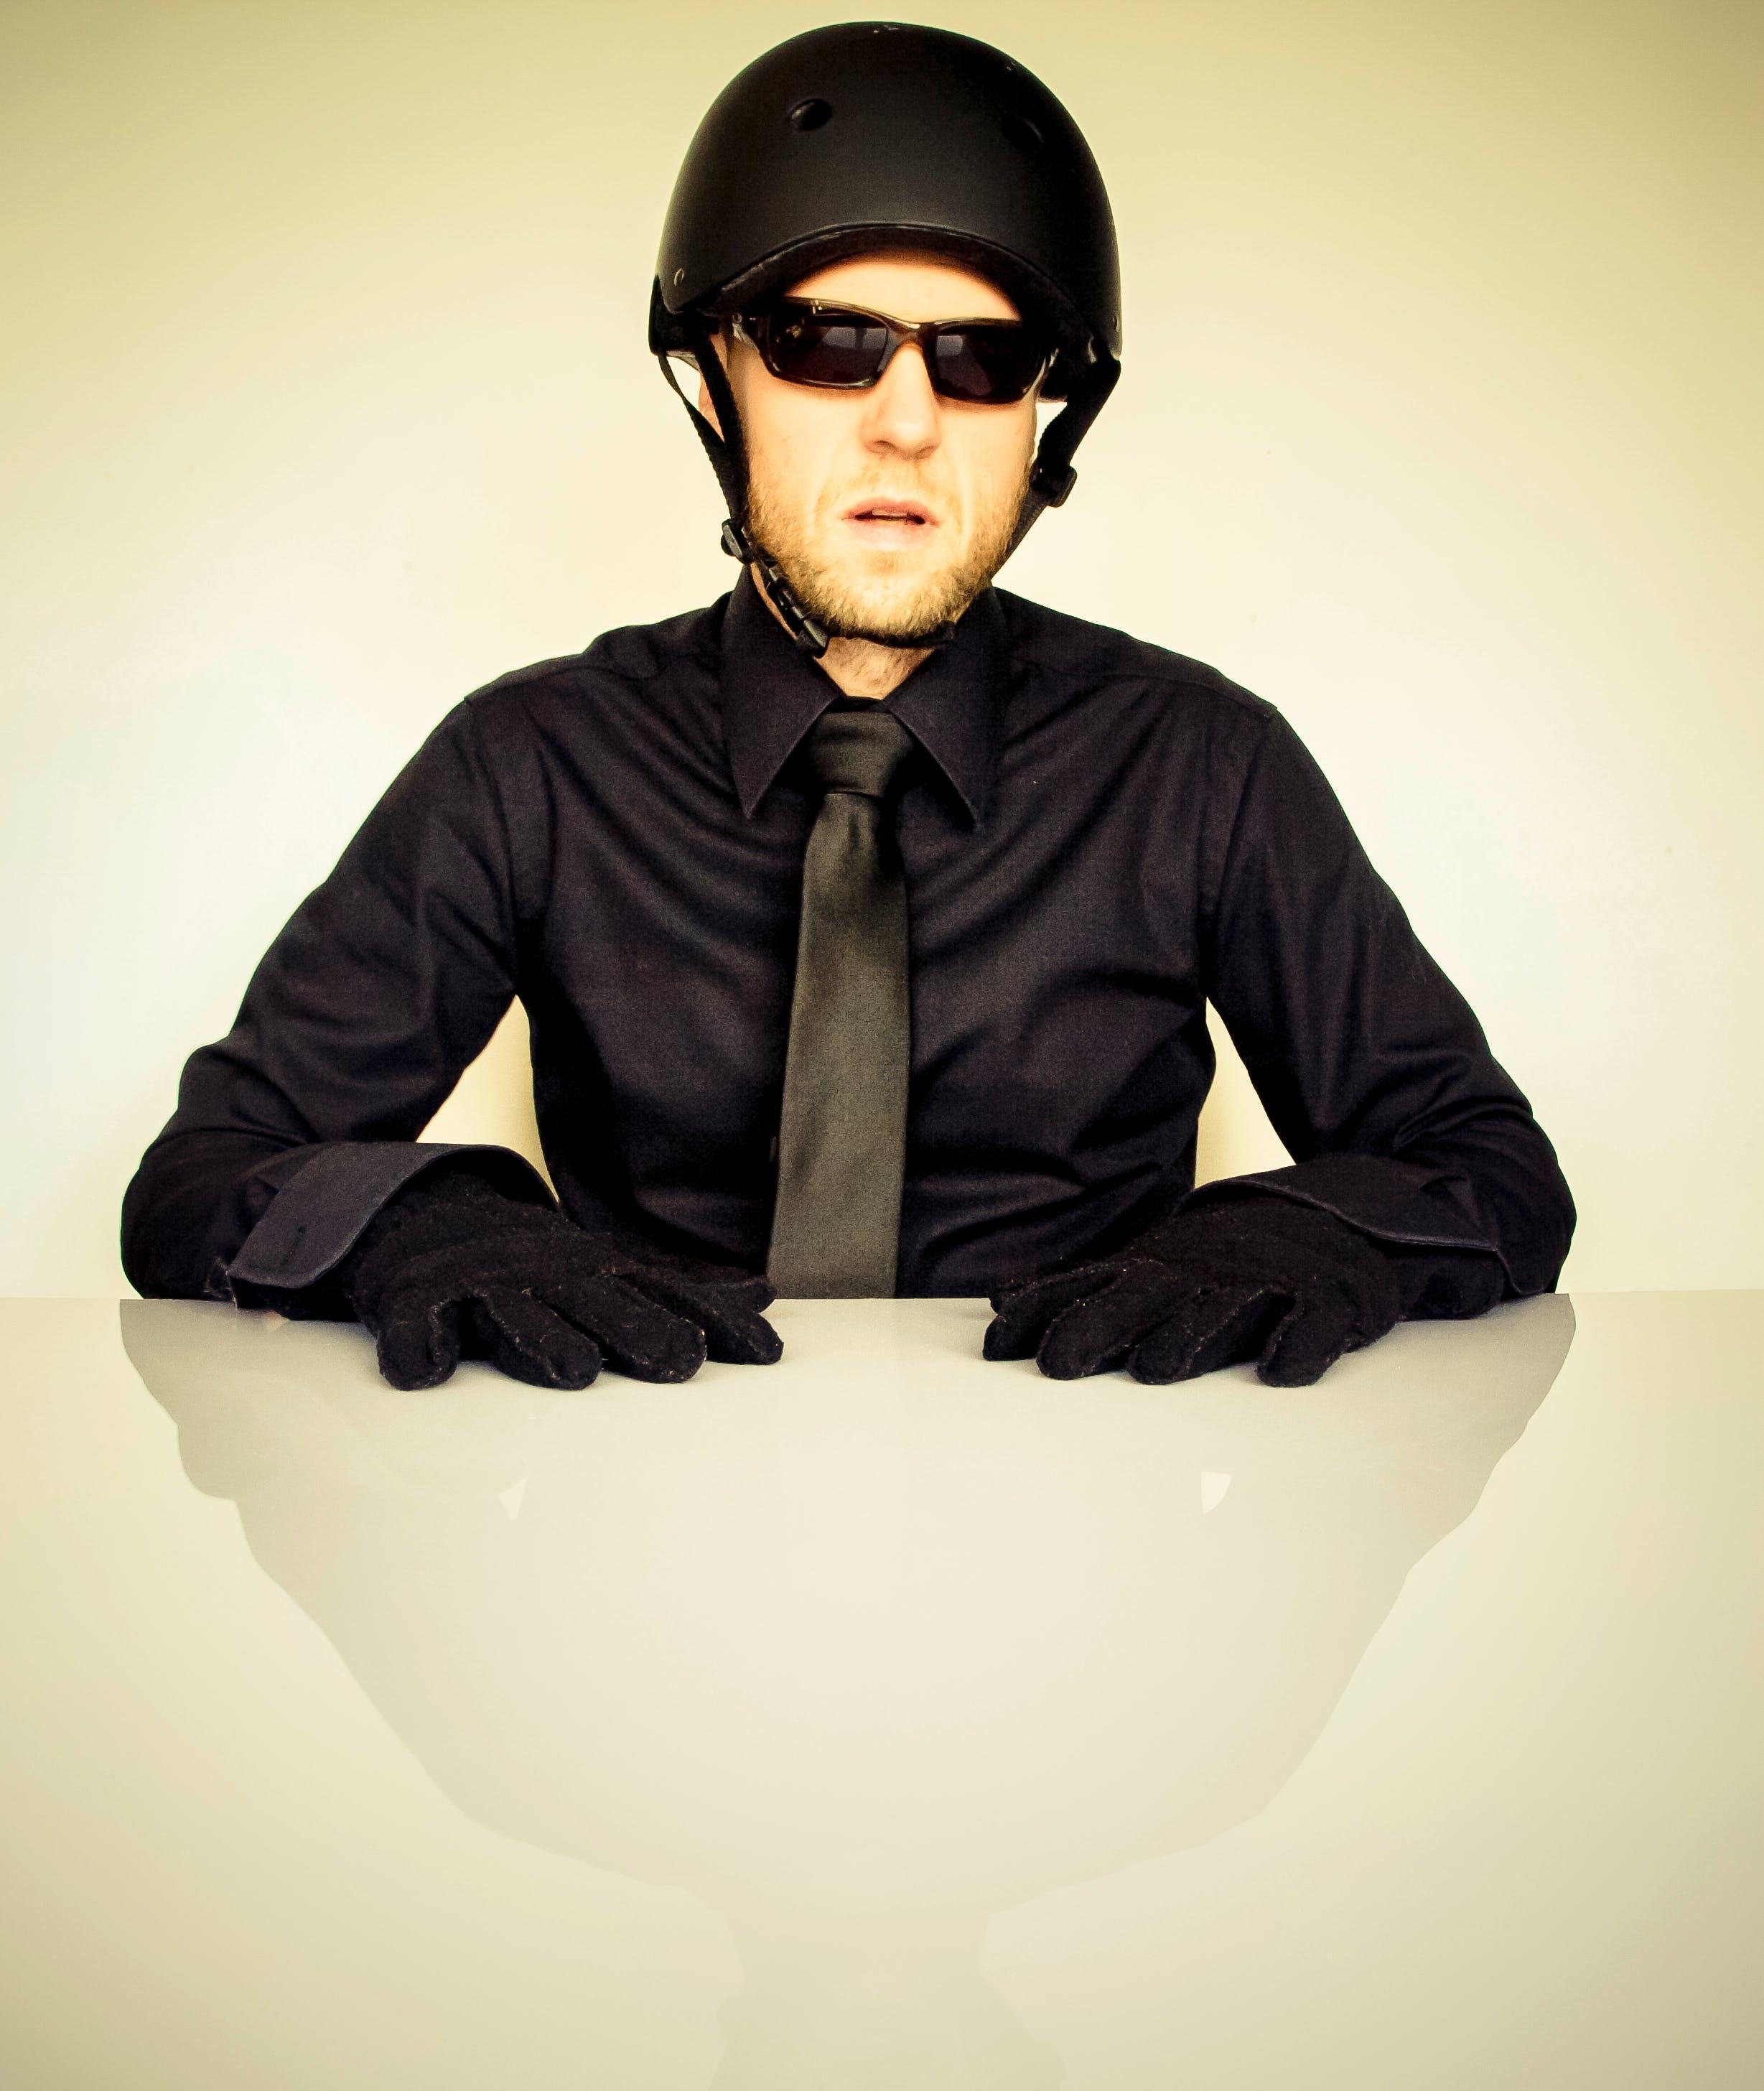 Man in Black Dress Shirt Wearing Half Helmet